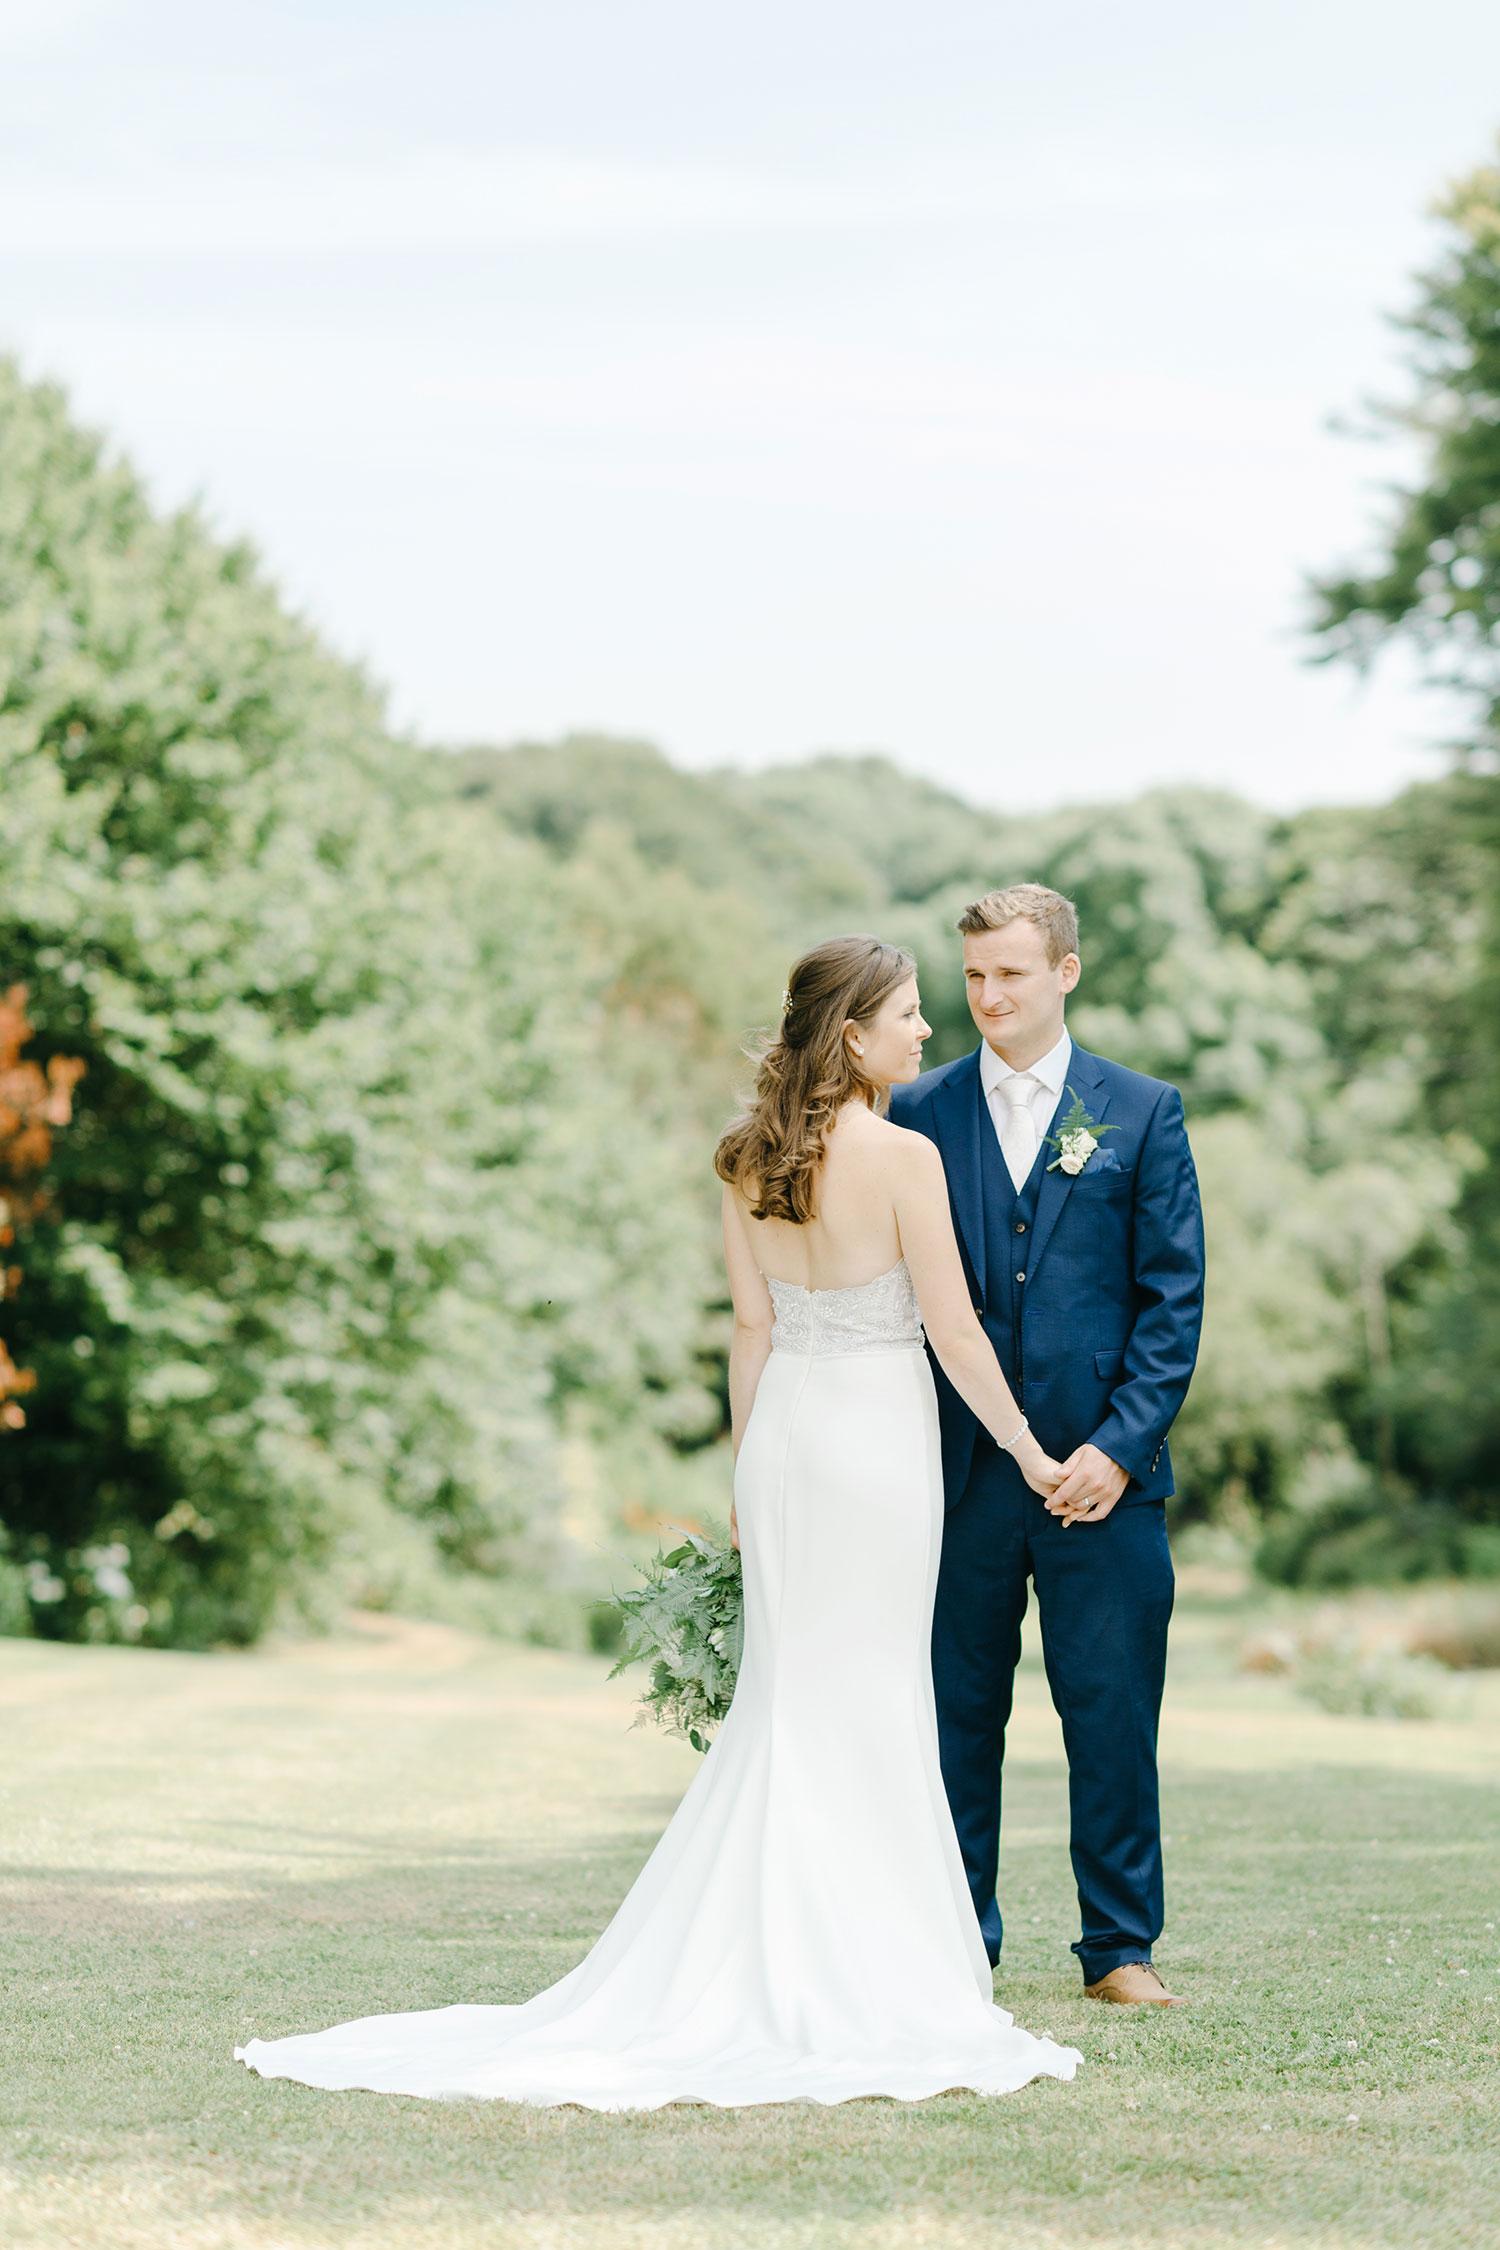 destination-wedding-photographer-ballinacurra-house-wedding-20180711_0053.jpg